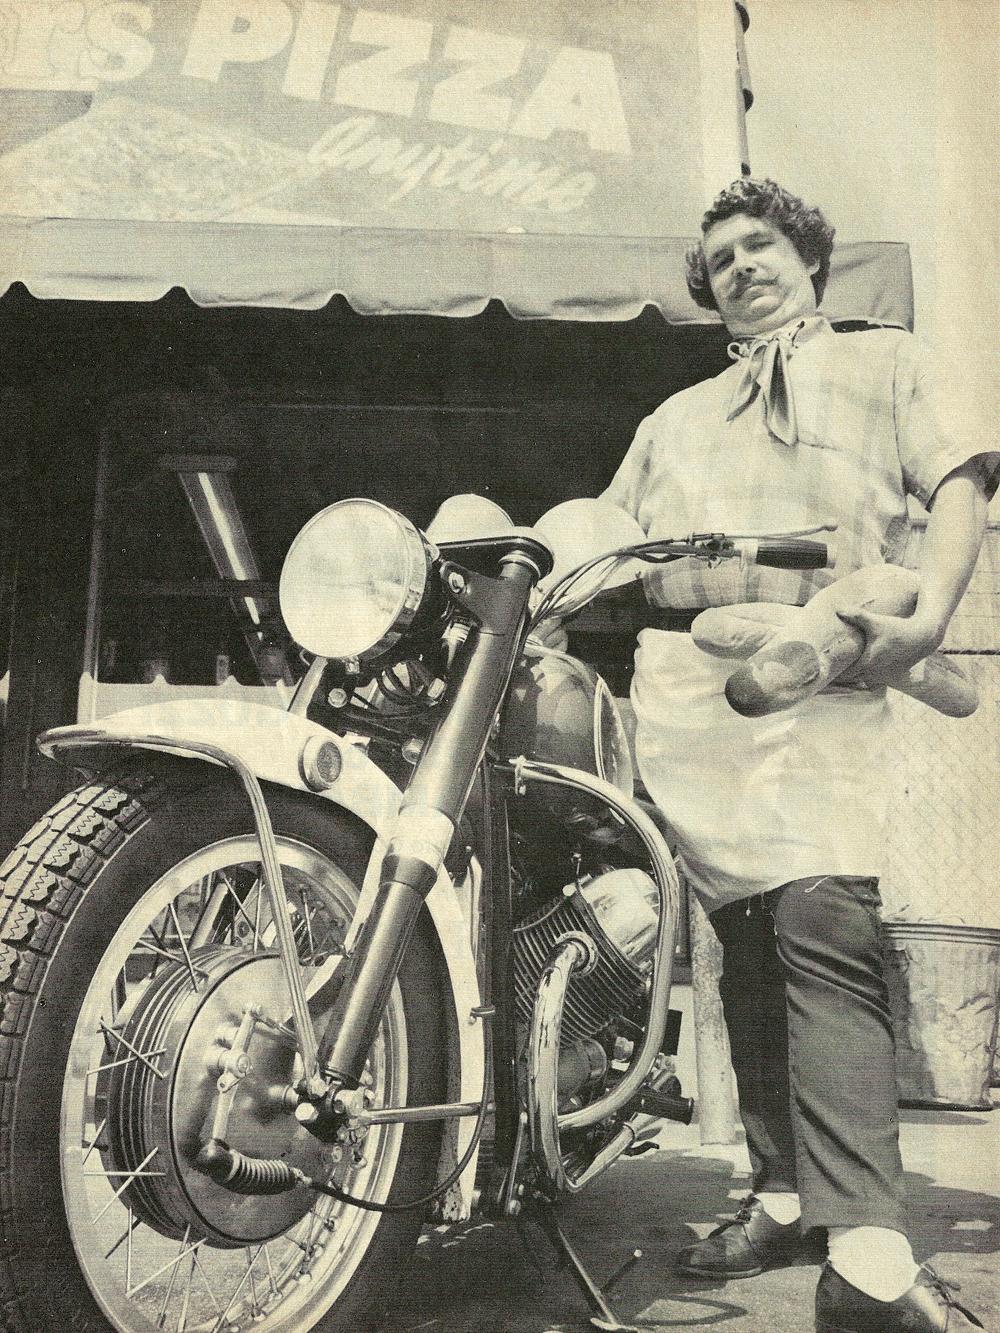 1969 Moto Guzzi 750 Ambassador road test 2.jpg